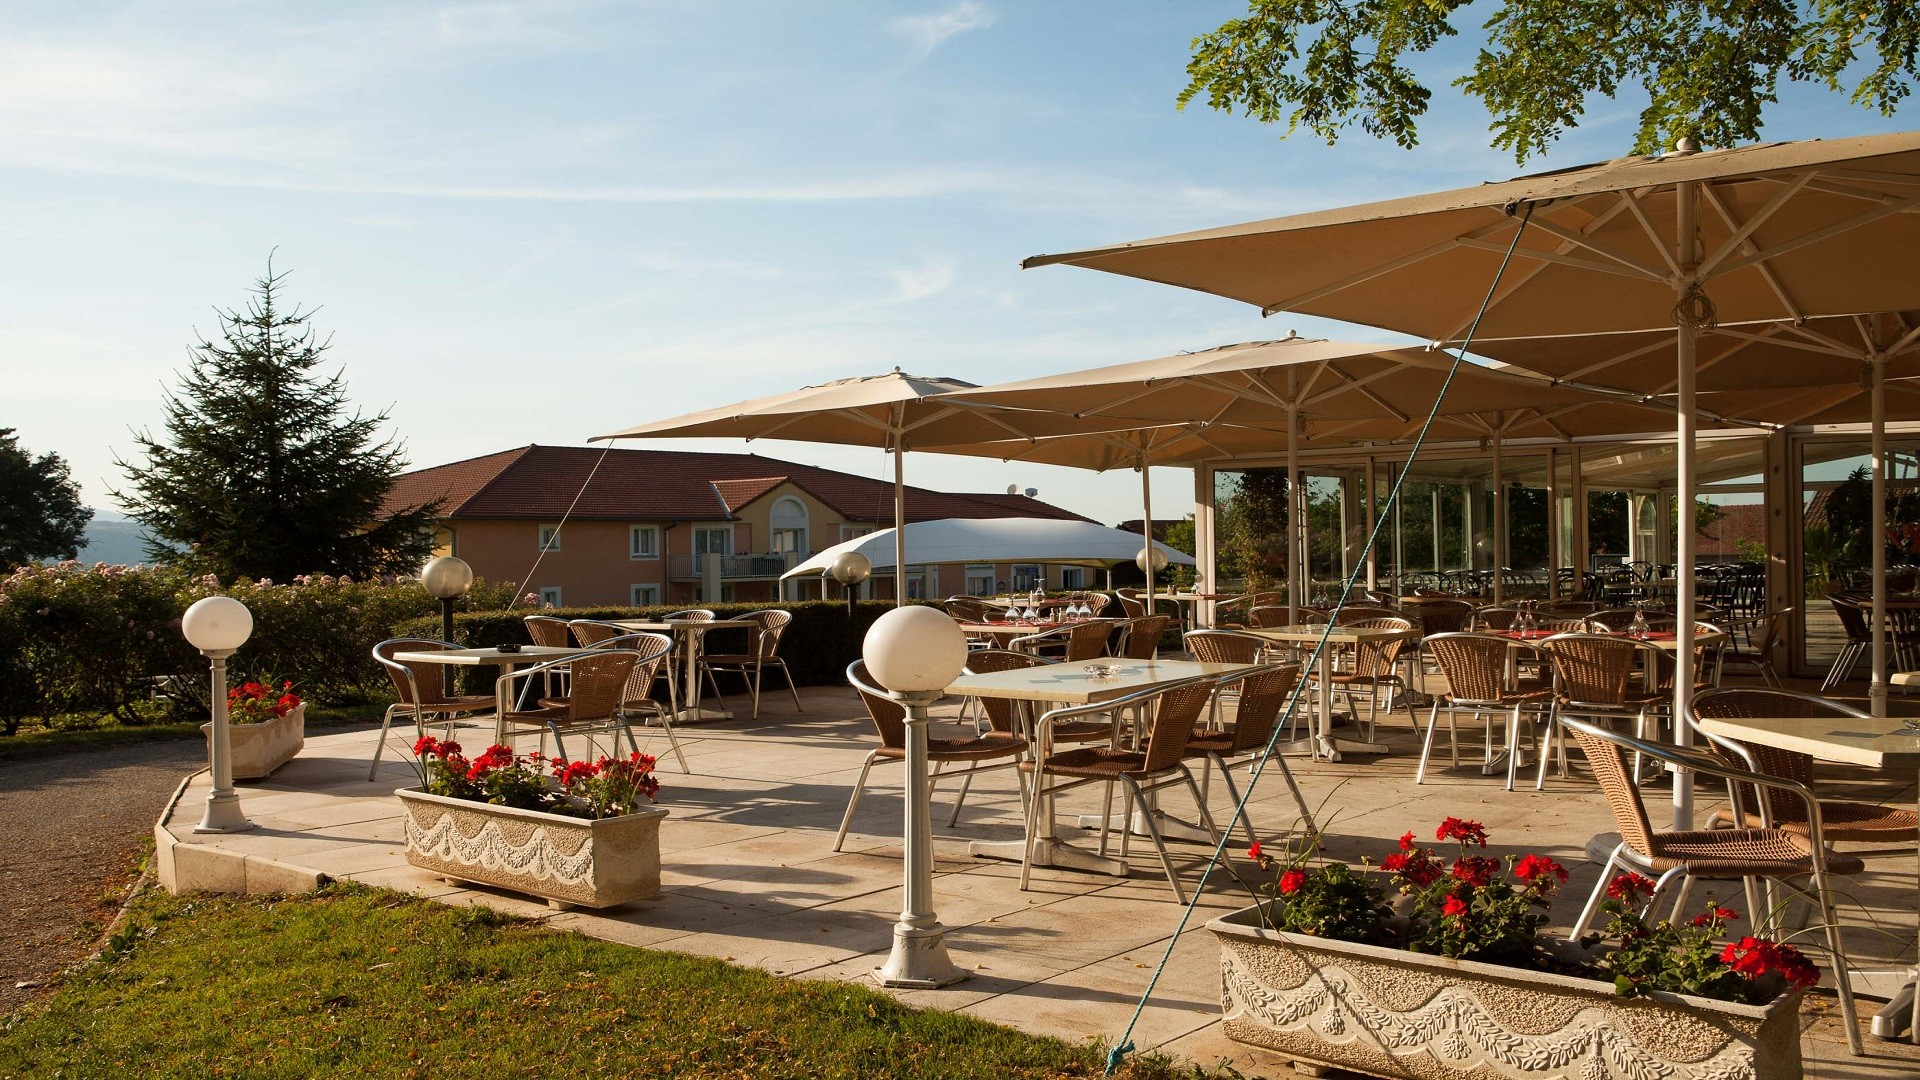 Domaine-golf-albon-senaud-vienne-valence-resort-seminaires-de-caractere